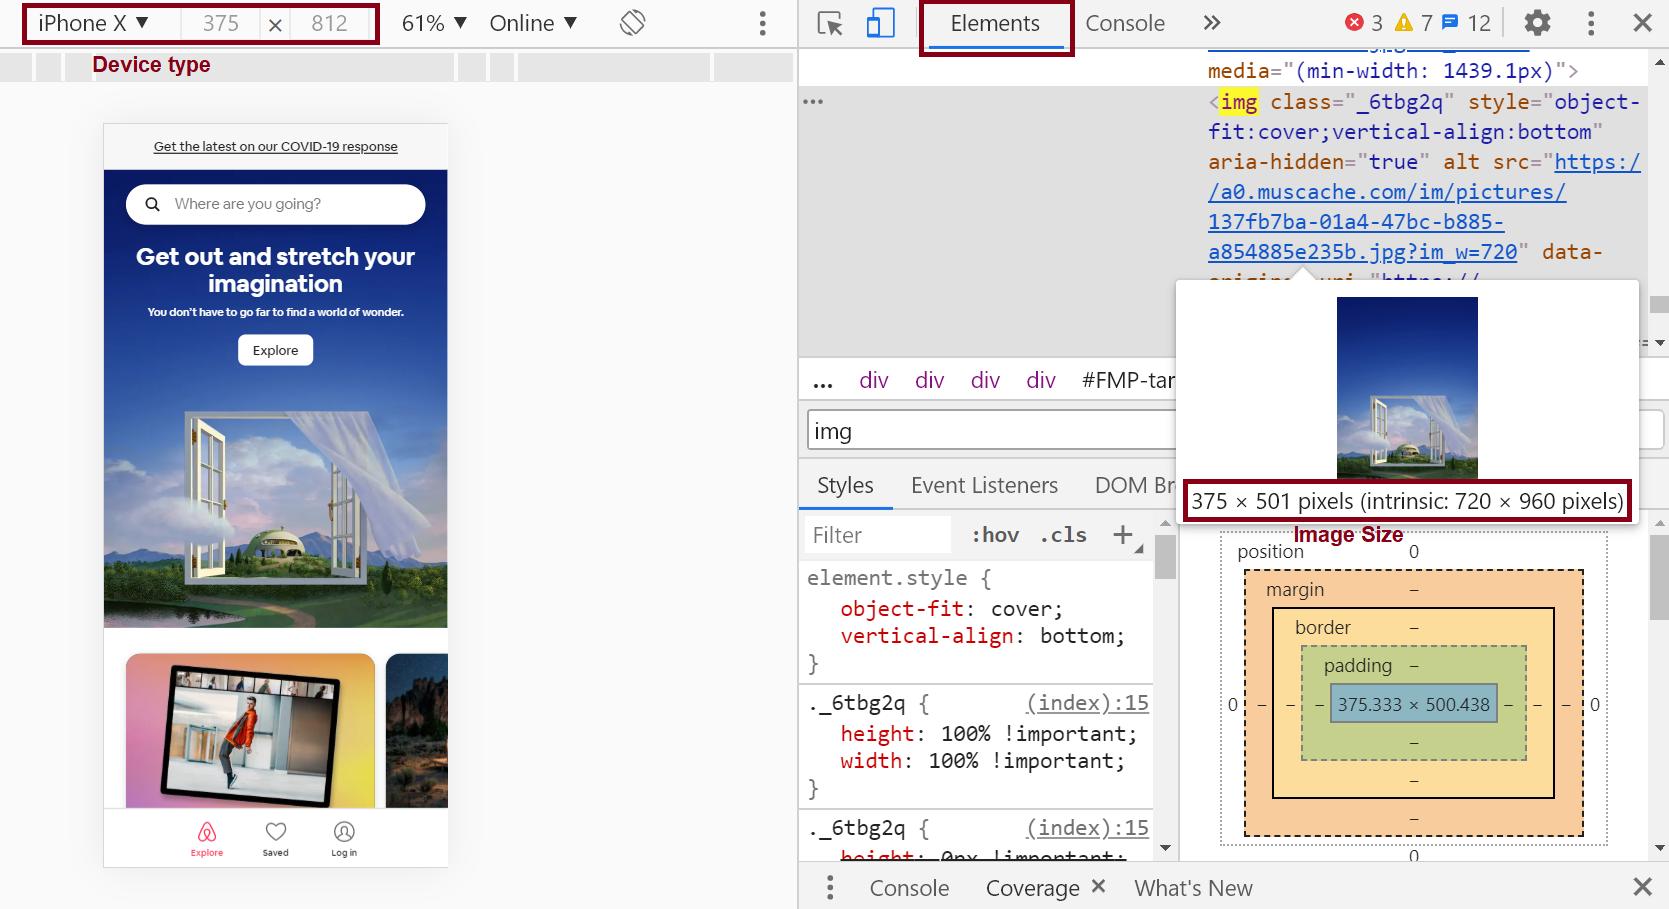 Elements Tab in DevTools